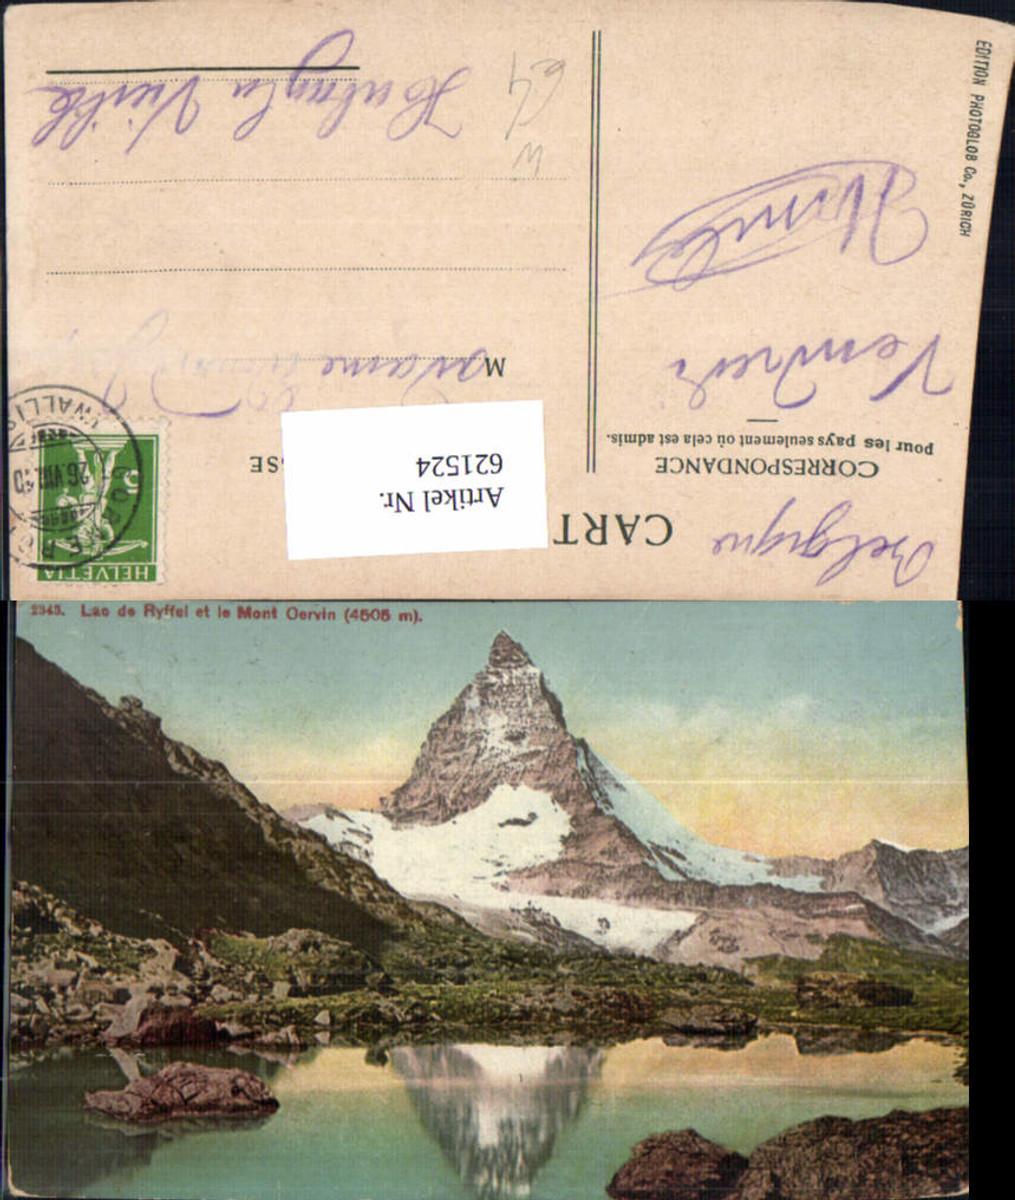 621524,Zermatt Lao de Ryffel et le Mont Cervin Matterhorn günstig online kaufen